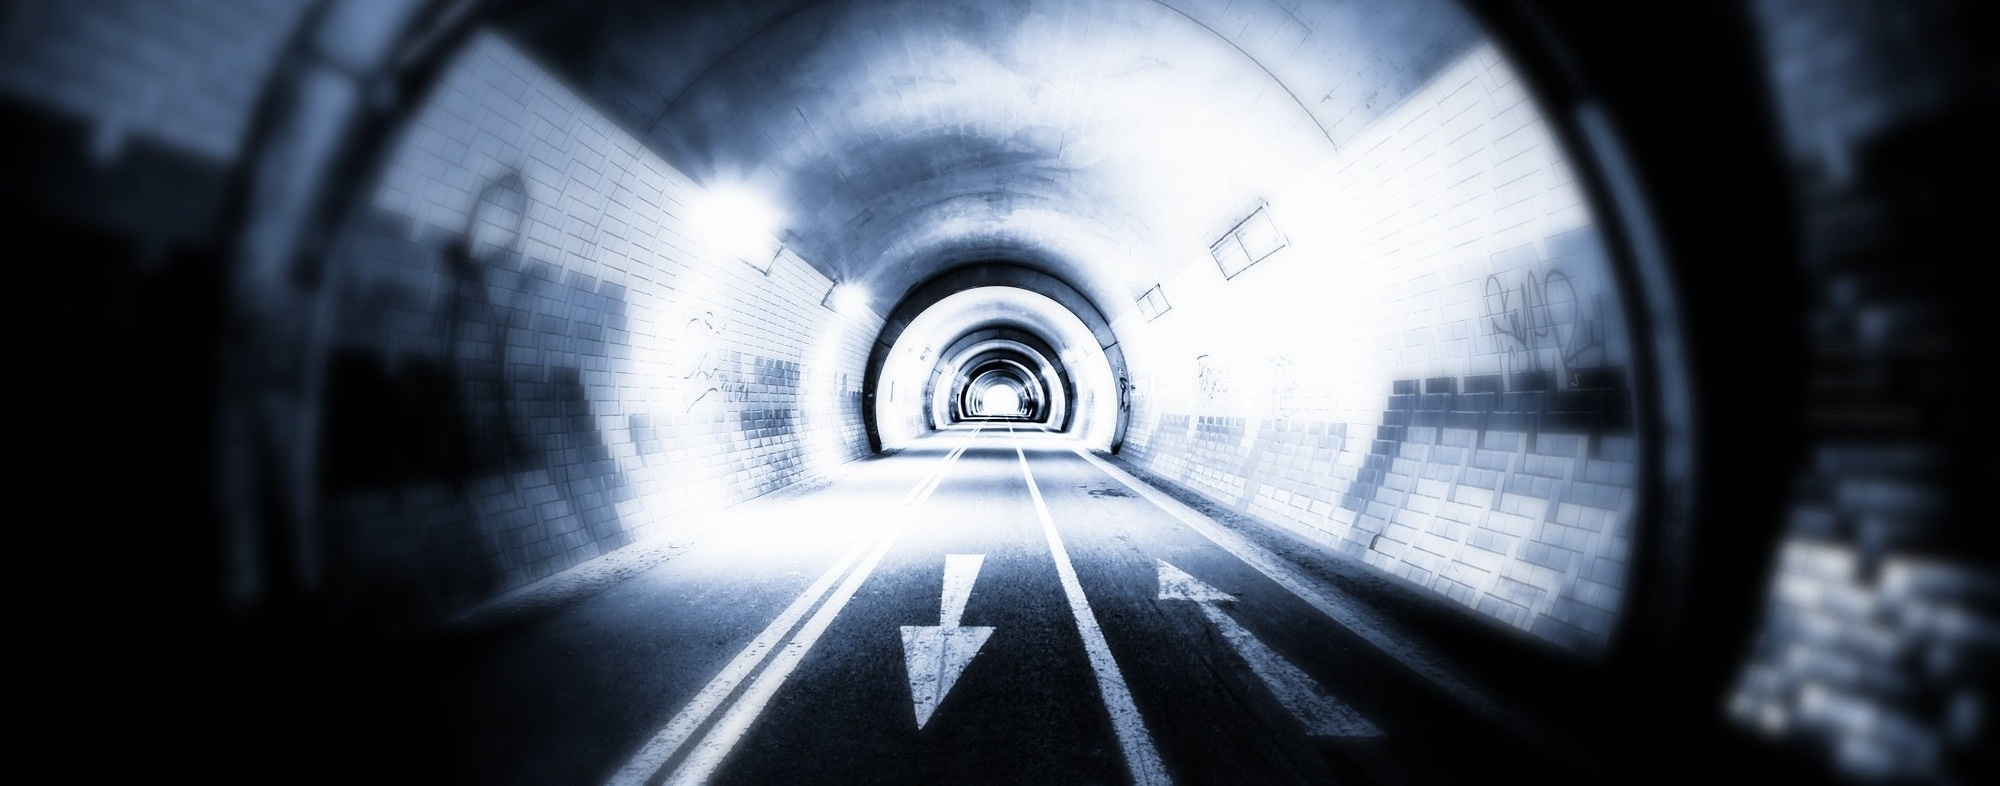 AdvisoryServices_Tunnel_Arrows-977640-edited-070673-edited.jpg